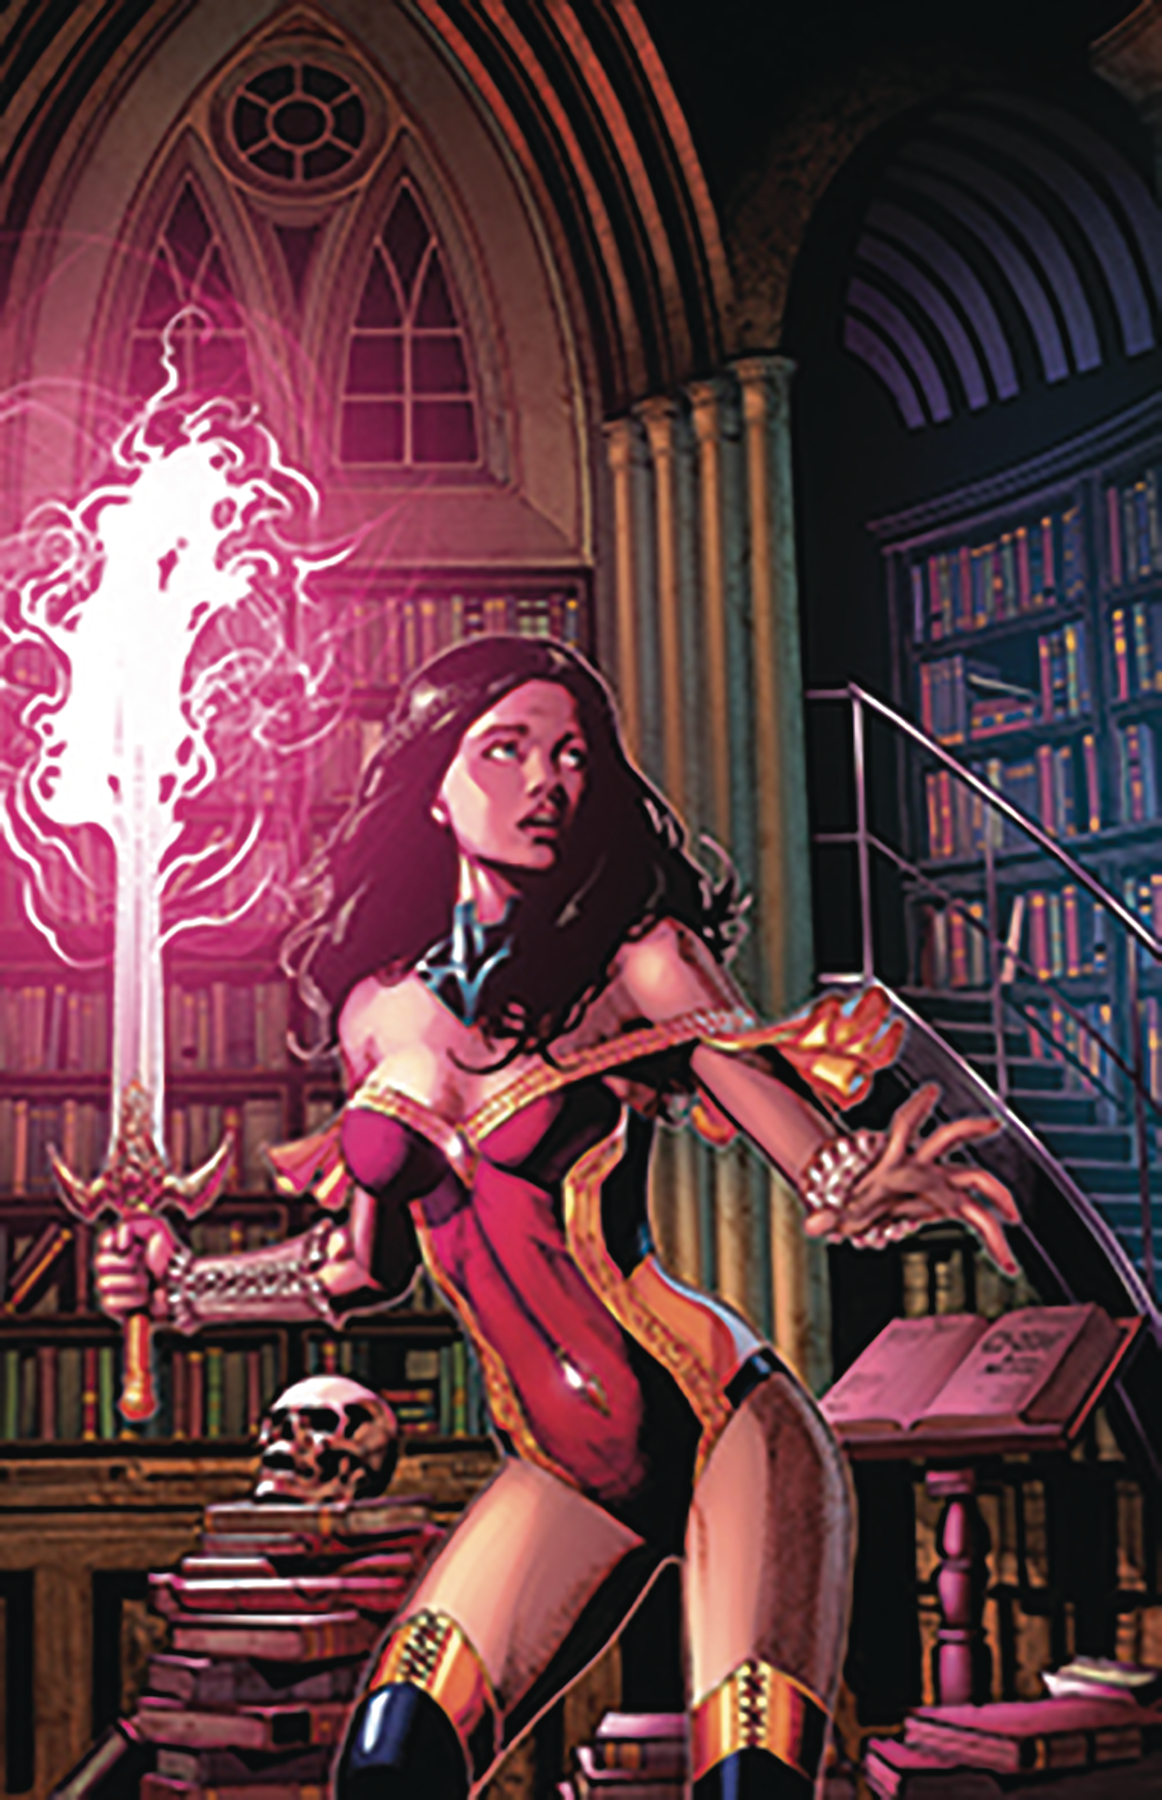 Grimm Fairy Tales Presents Wonderland Vol 1 26 | Zenescope ... |Grimm Fairy Tales Original Art